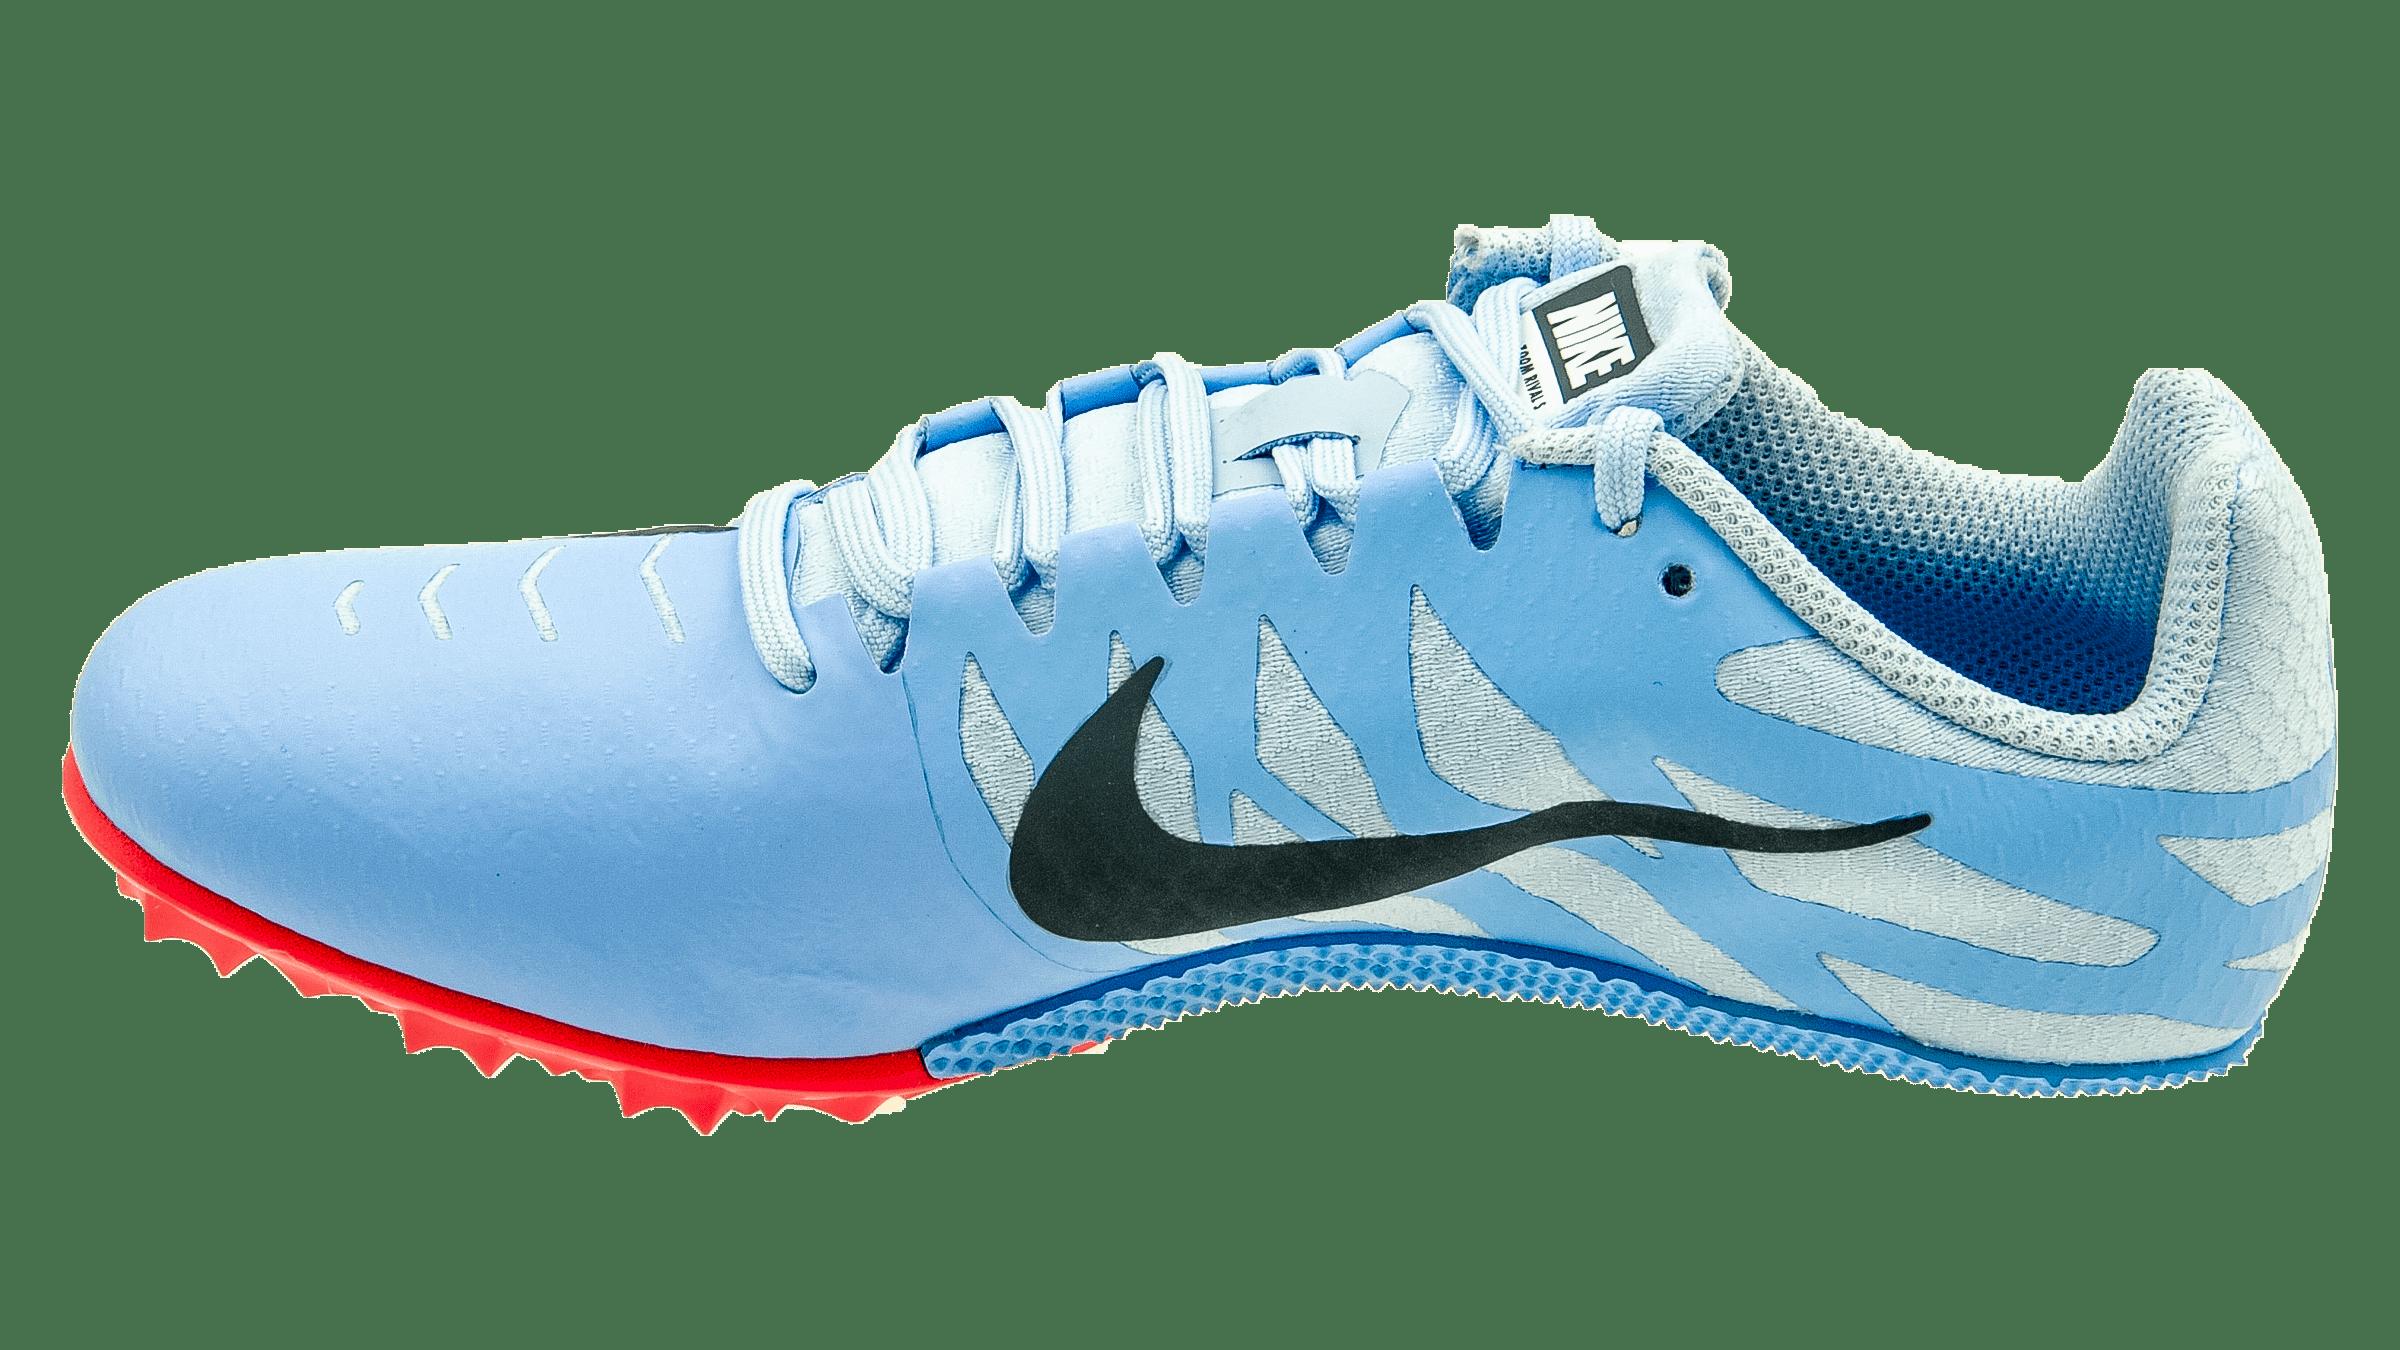 best service a8f57 2ff00 NikeZoom Rival S9 football blue blue fox  unisex